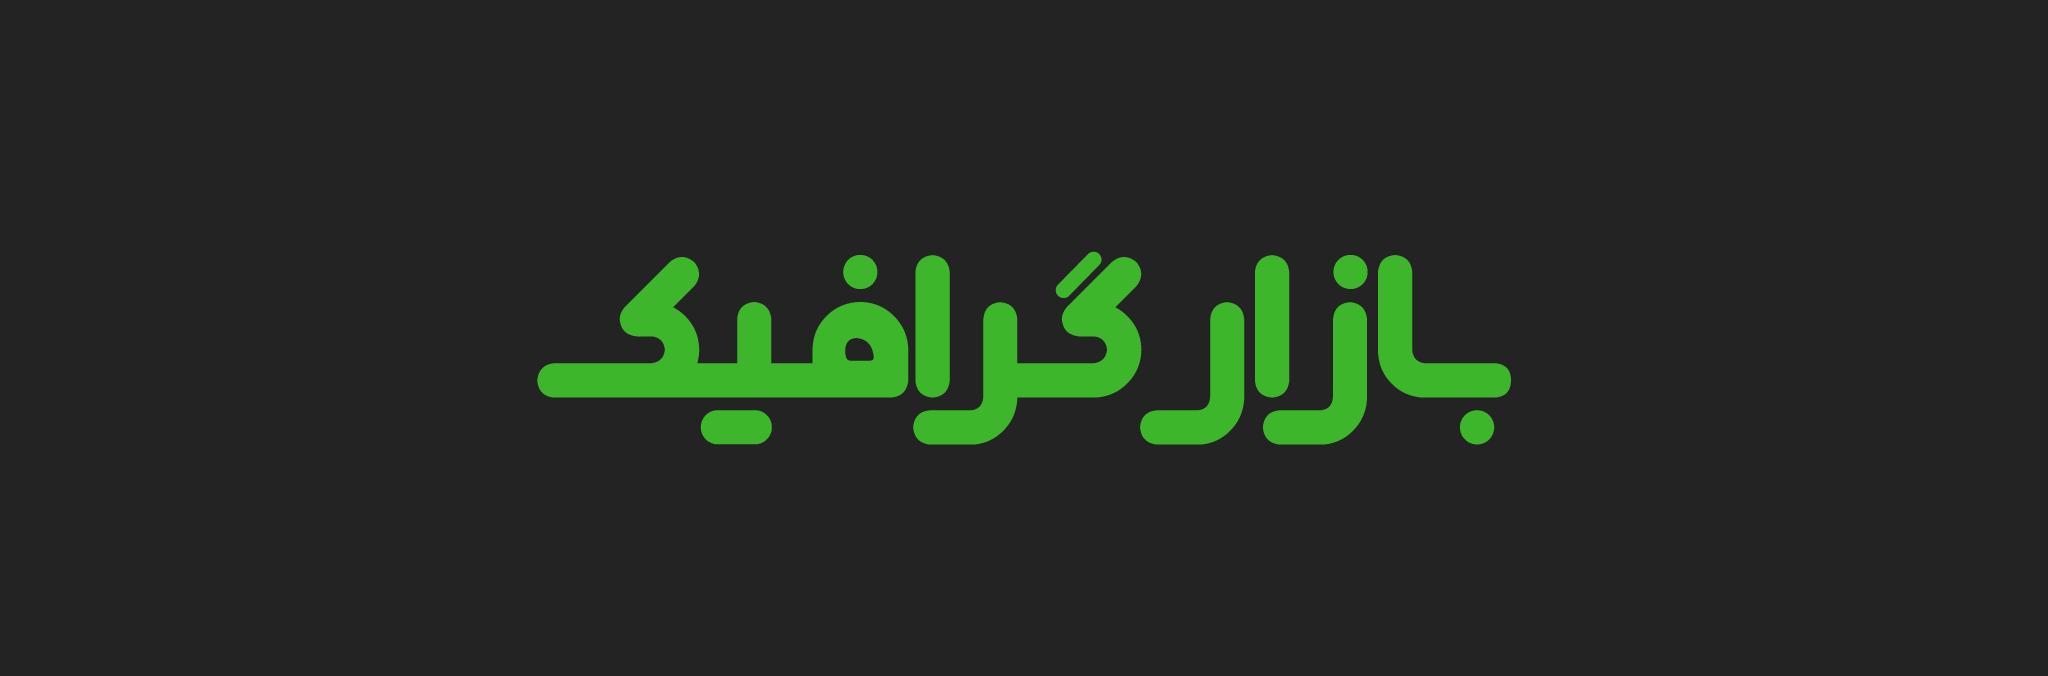 فونت فارسی لوگو تایپ کافه بازار